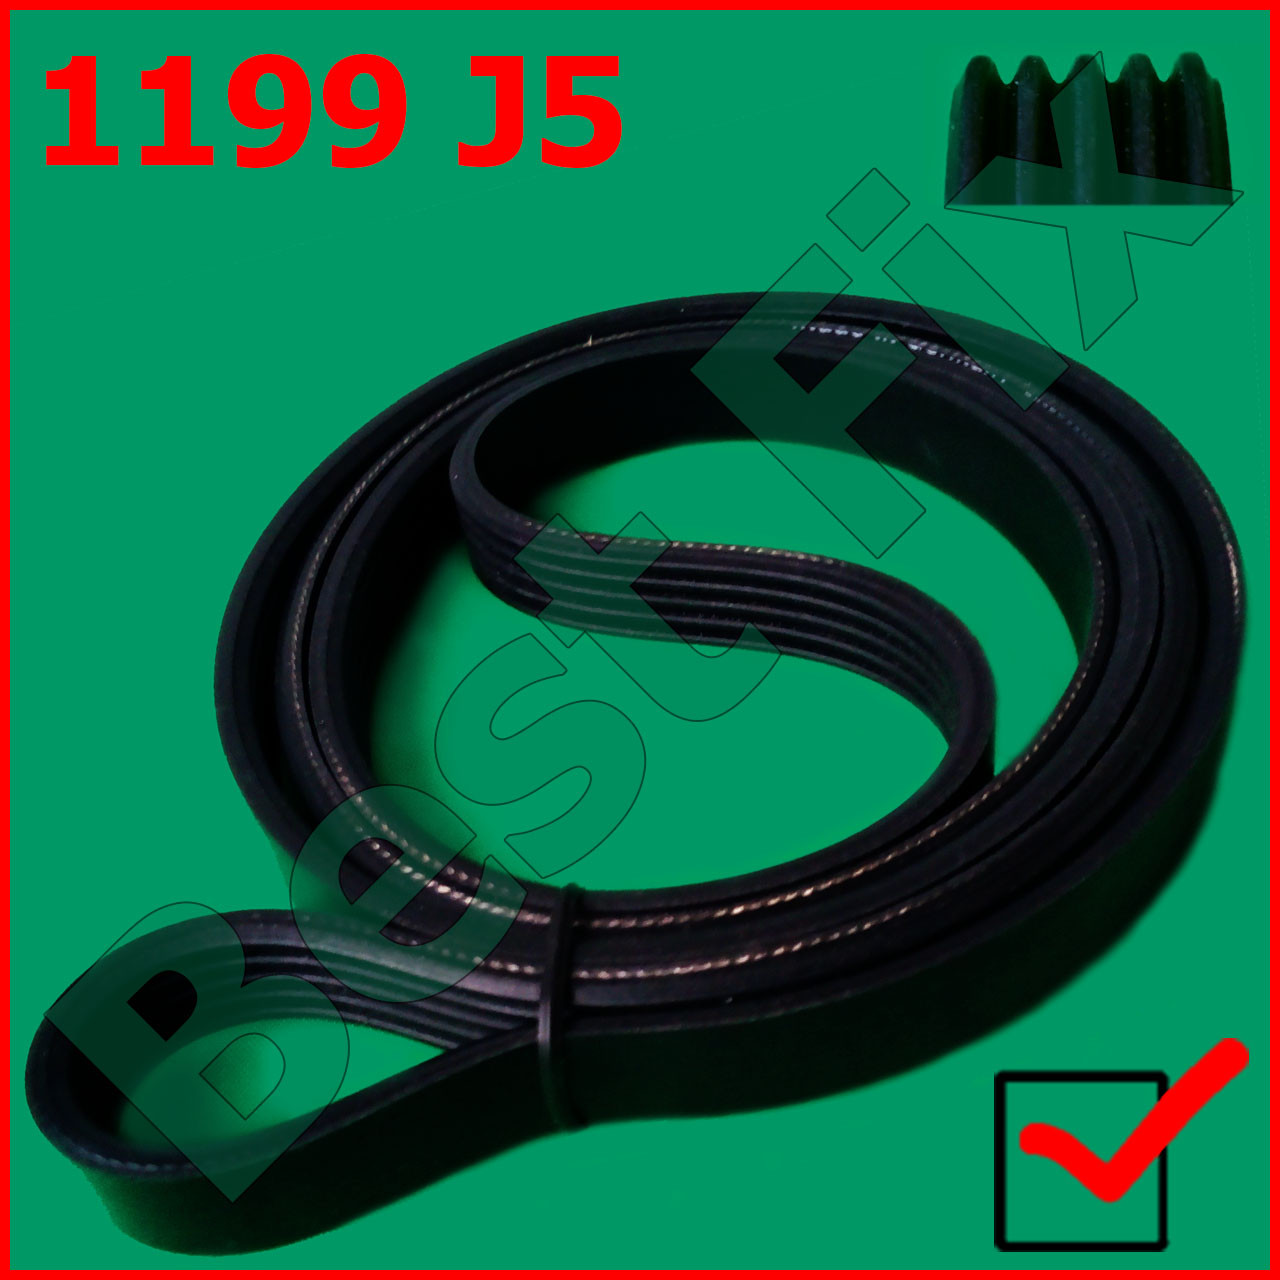 Ремень 1199 J5 PJE Hutchnson черный